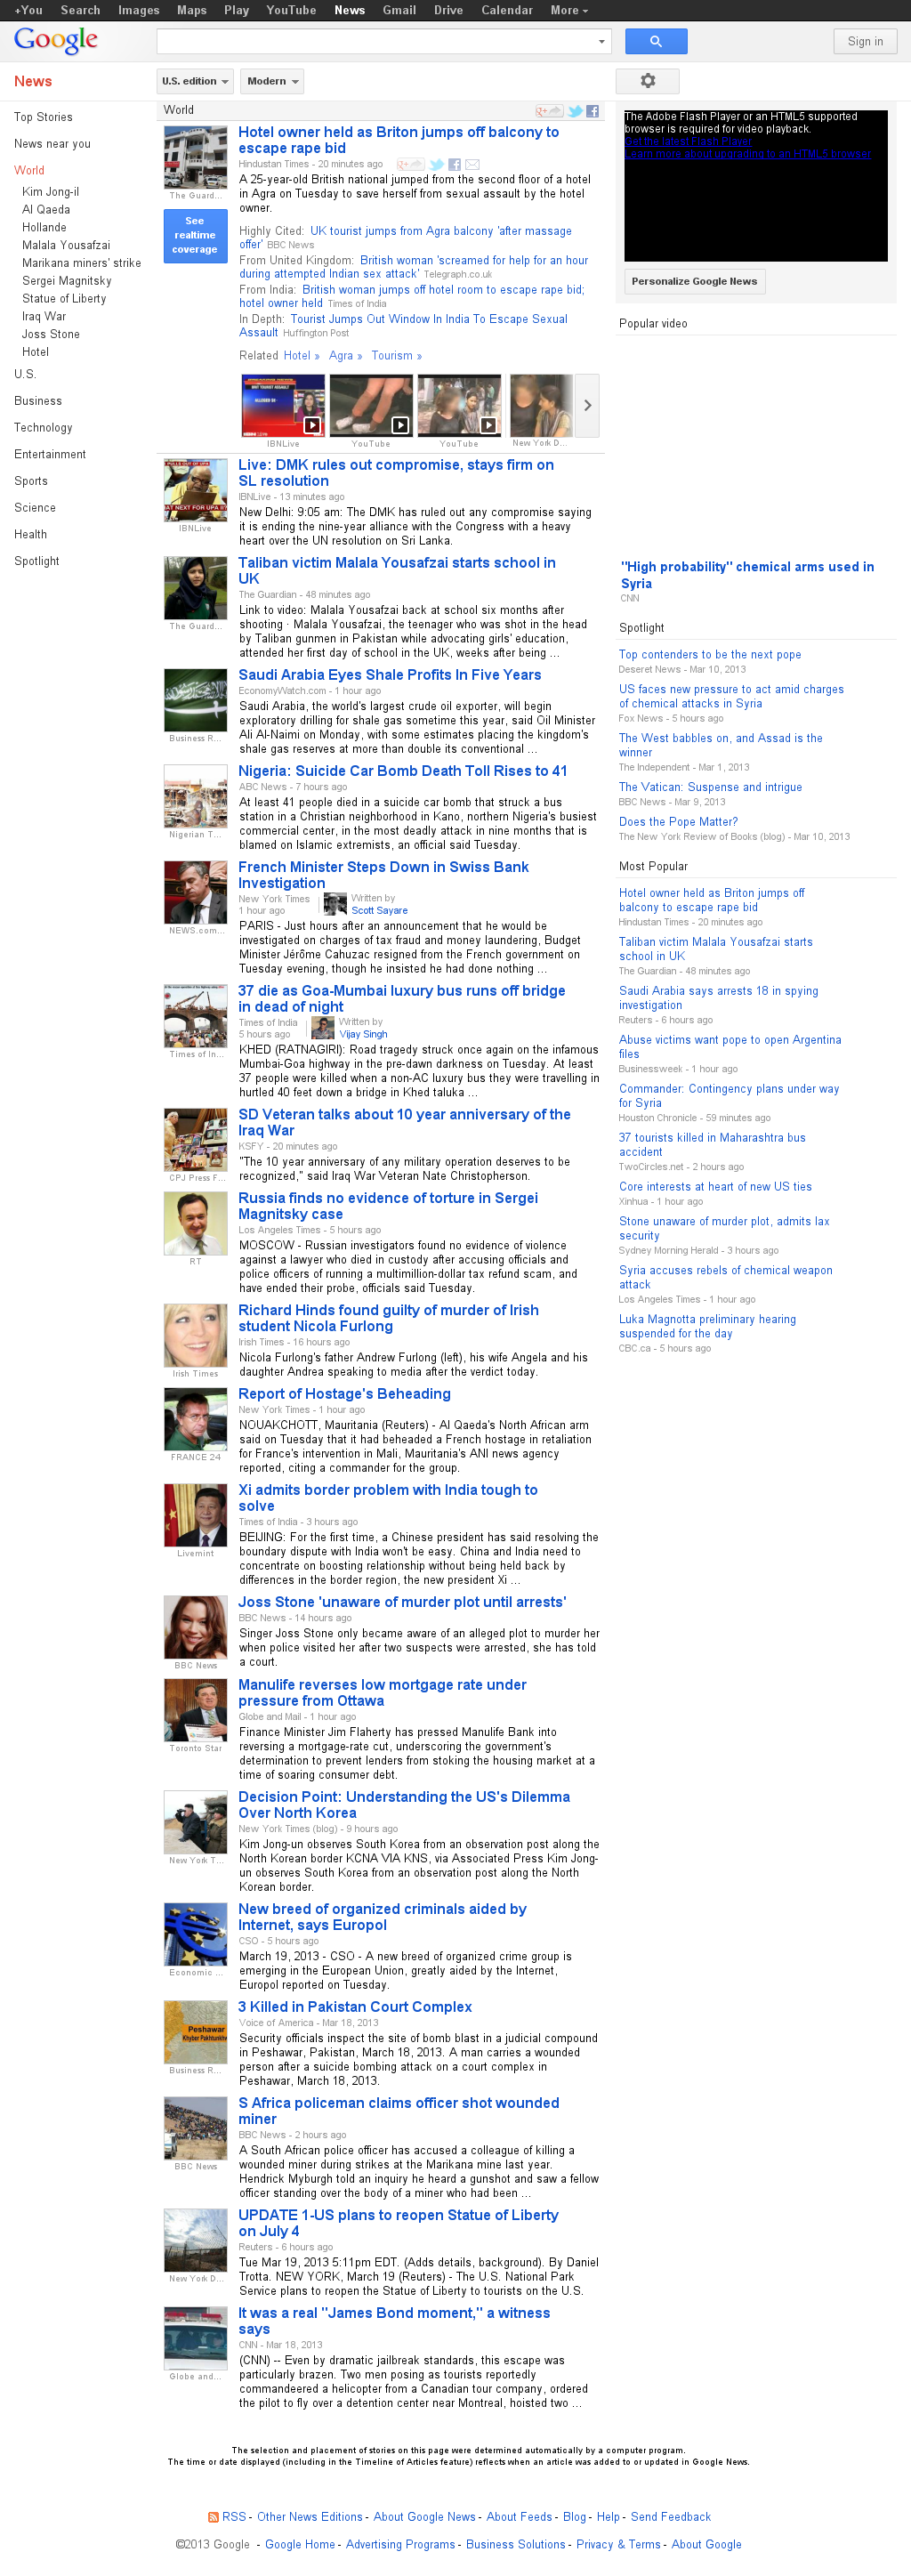 Google News: World at Wednesday March 20, 2013, 4:12 a.m. UTC